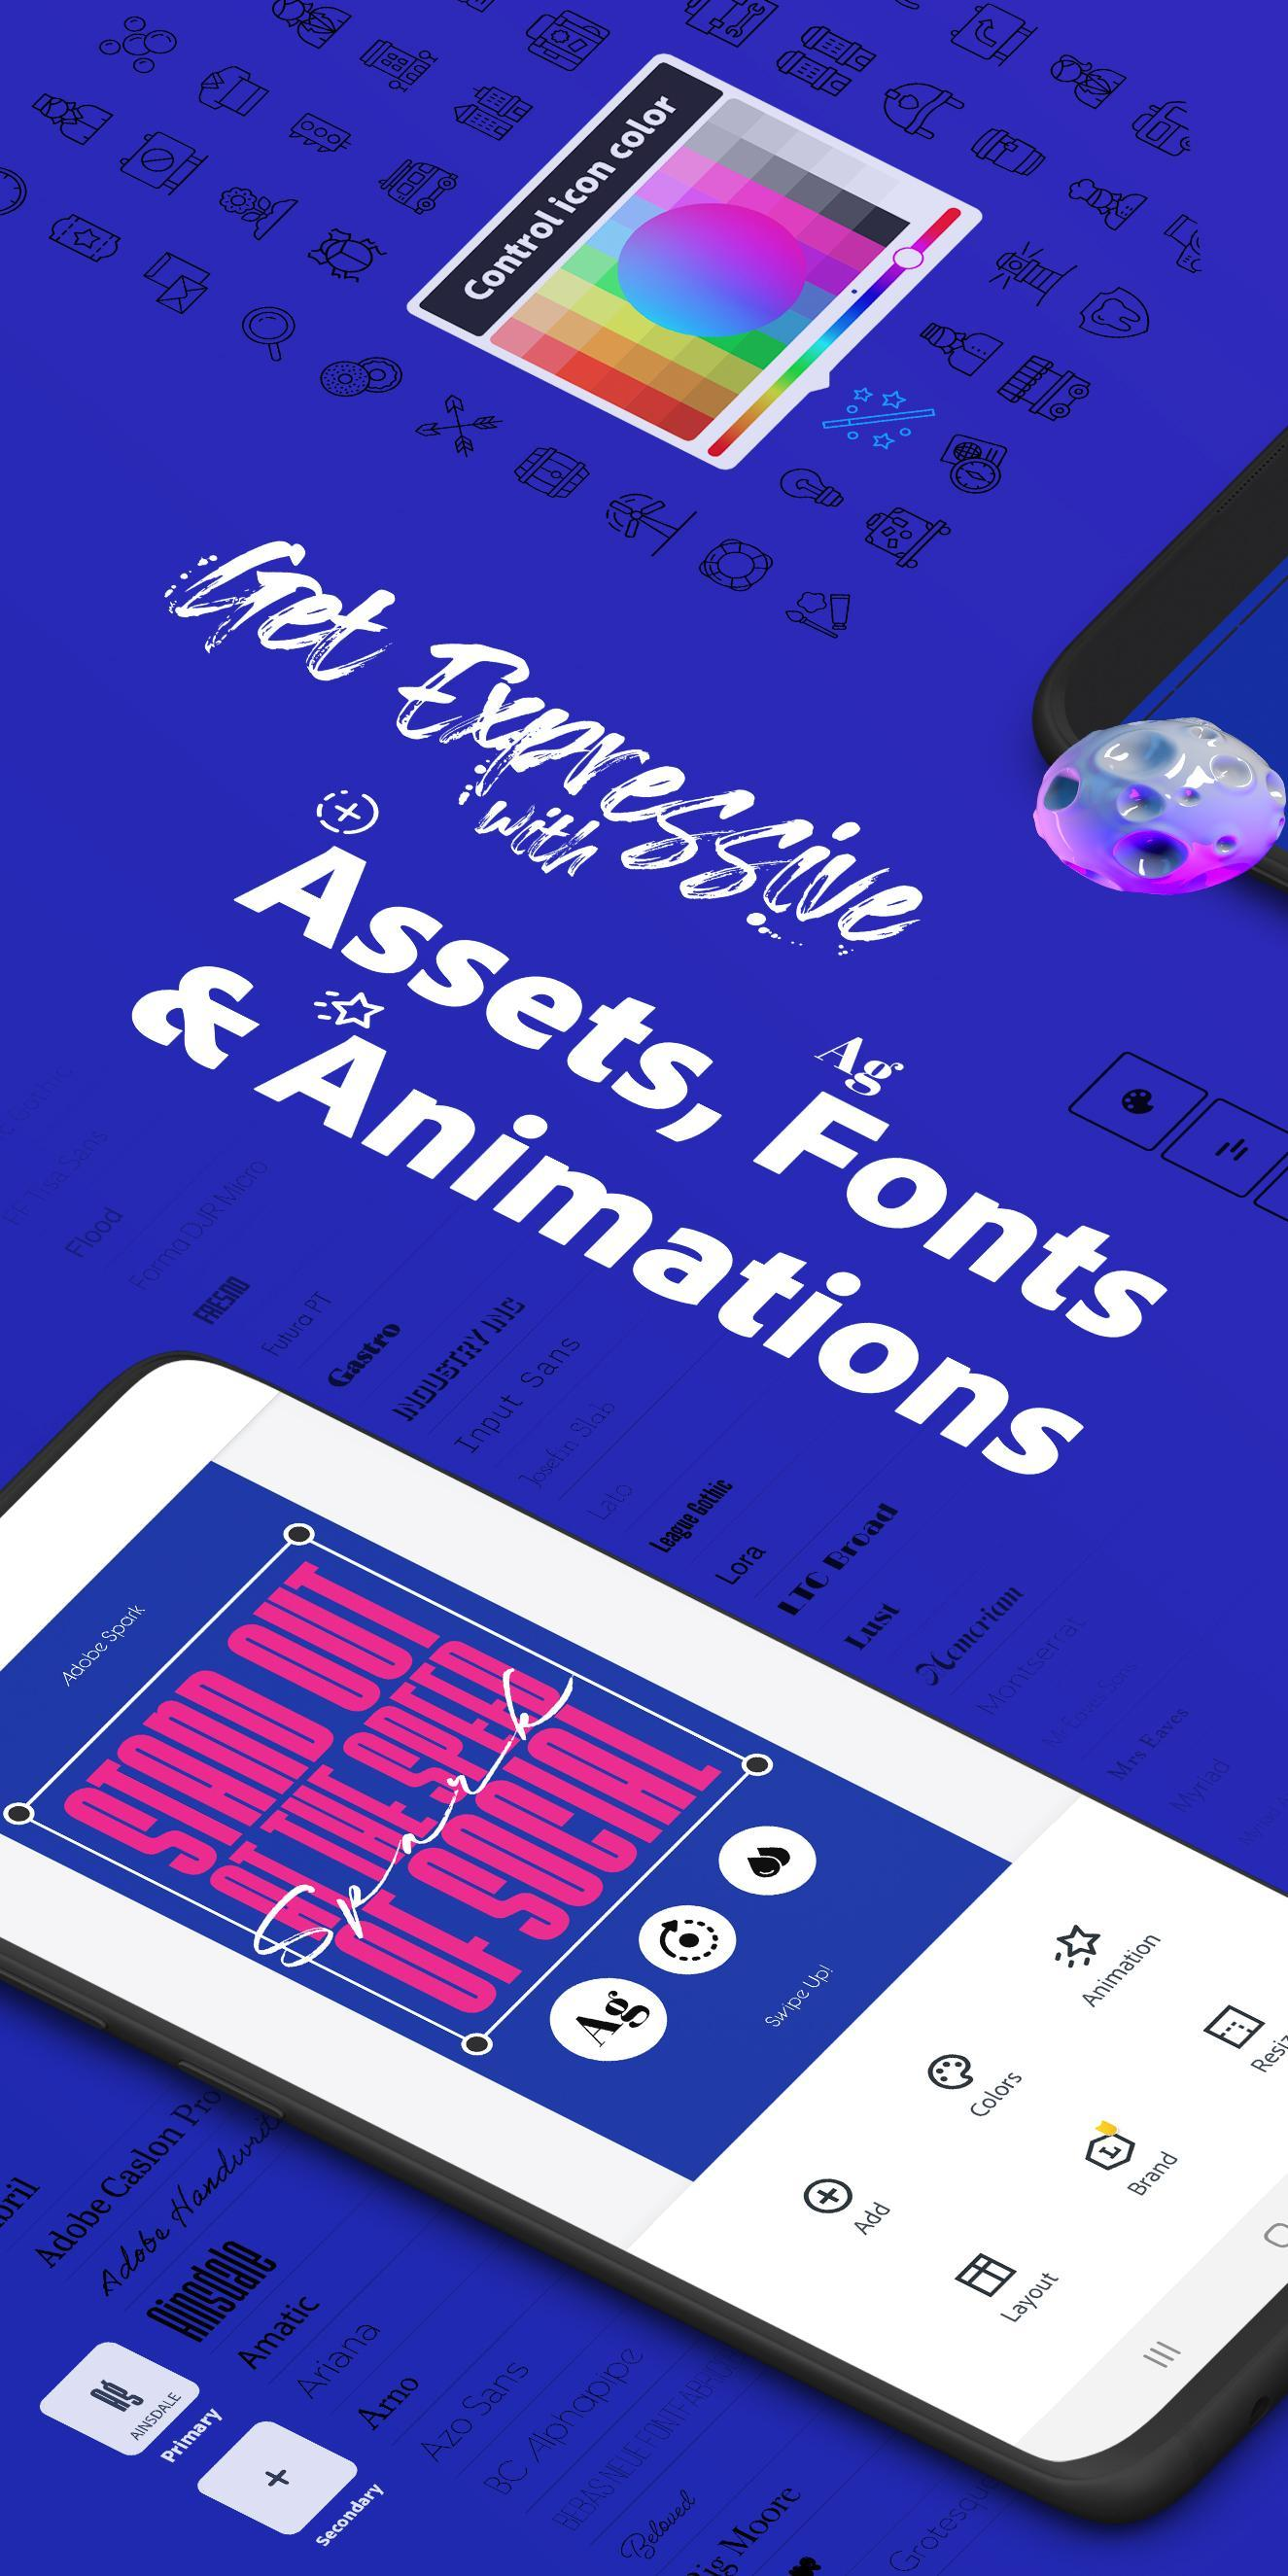 Adobe Spark Post: Graphic design made easy 4.6.0 Screenshot 3